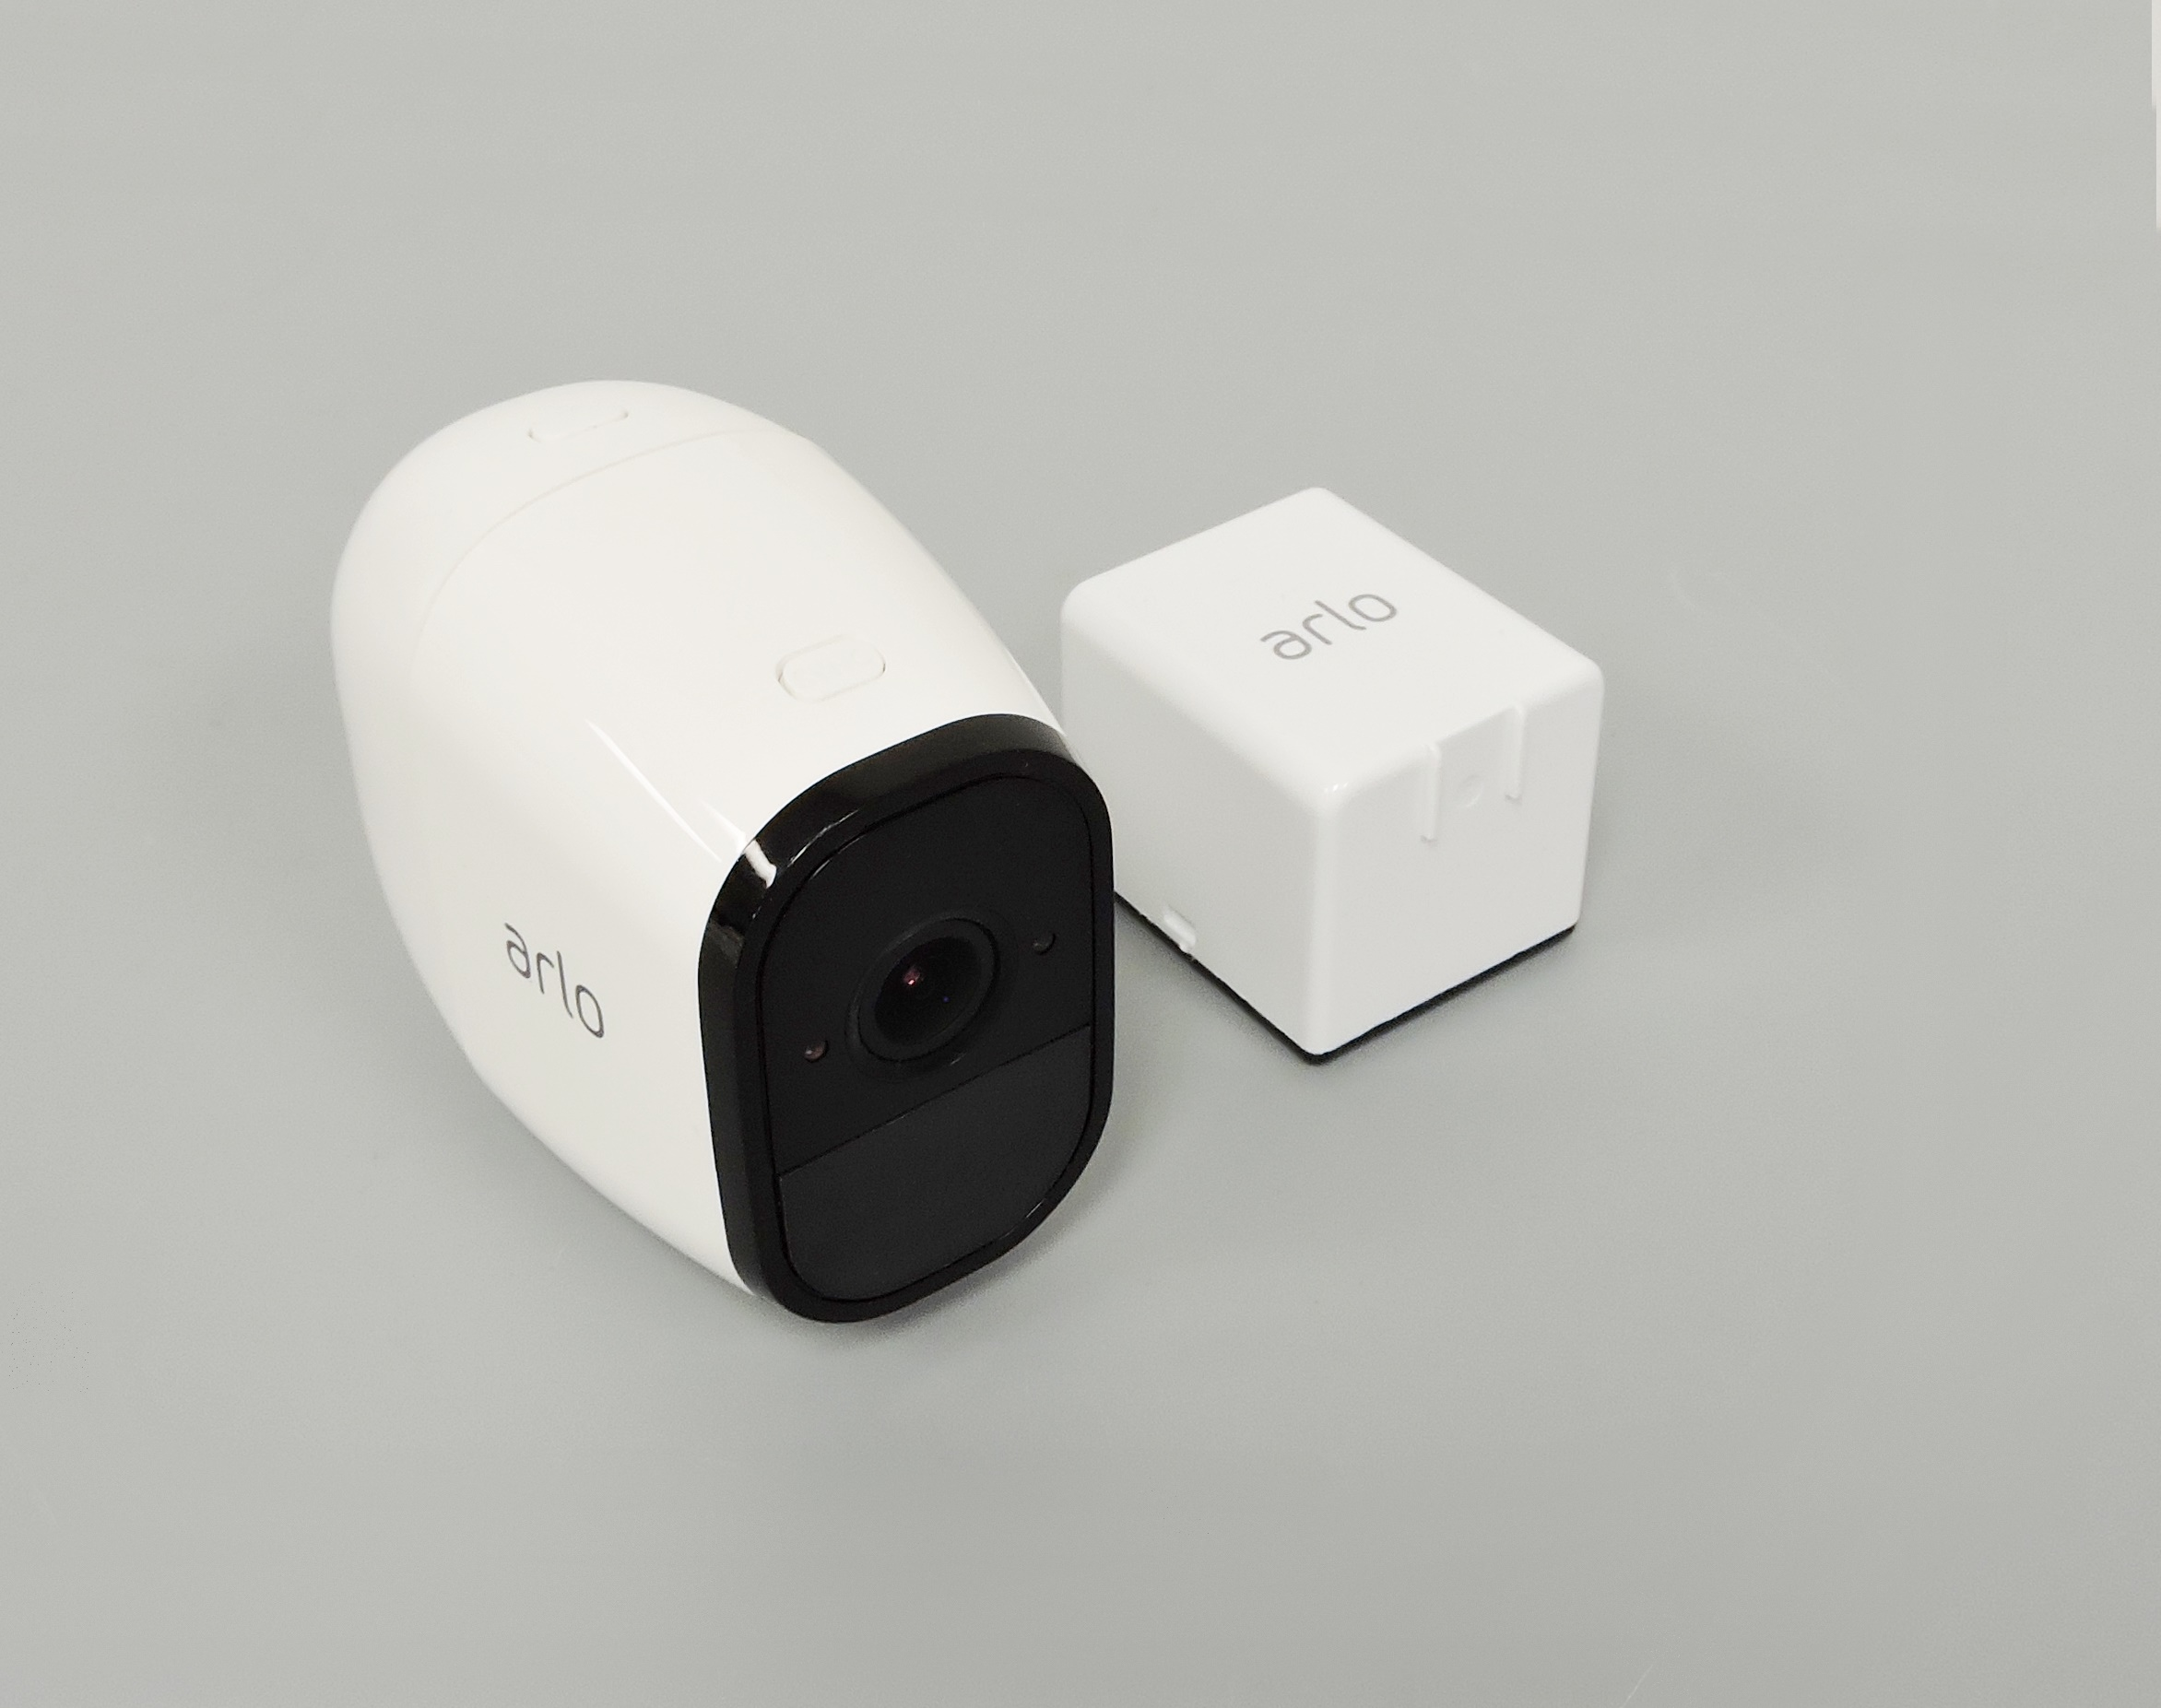 Add-on Camera 1 Certified Refurbished Arlo Pro 2 VMC4030P-100NAR